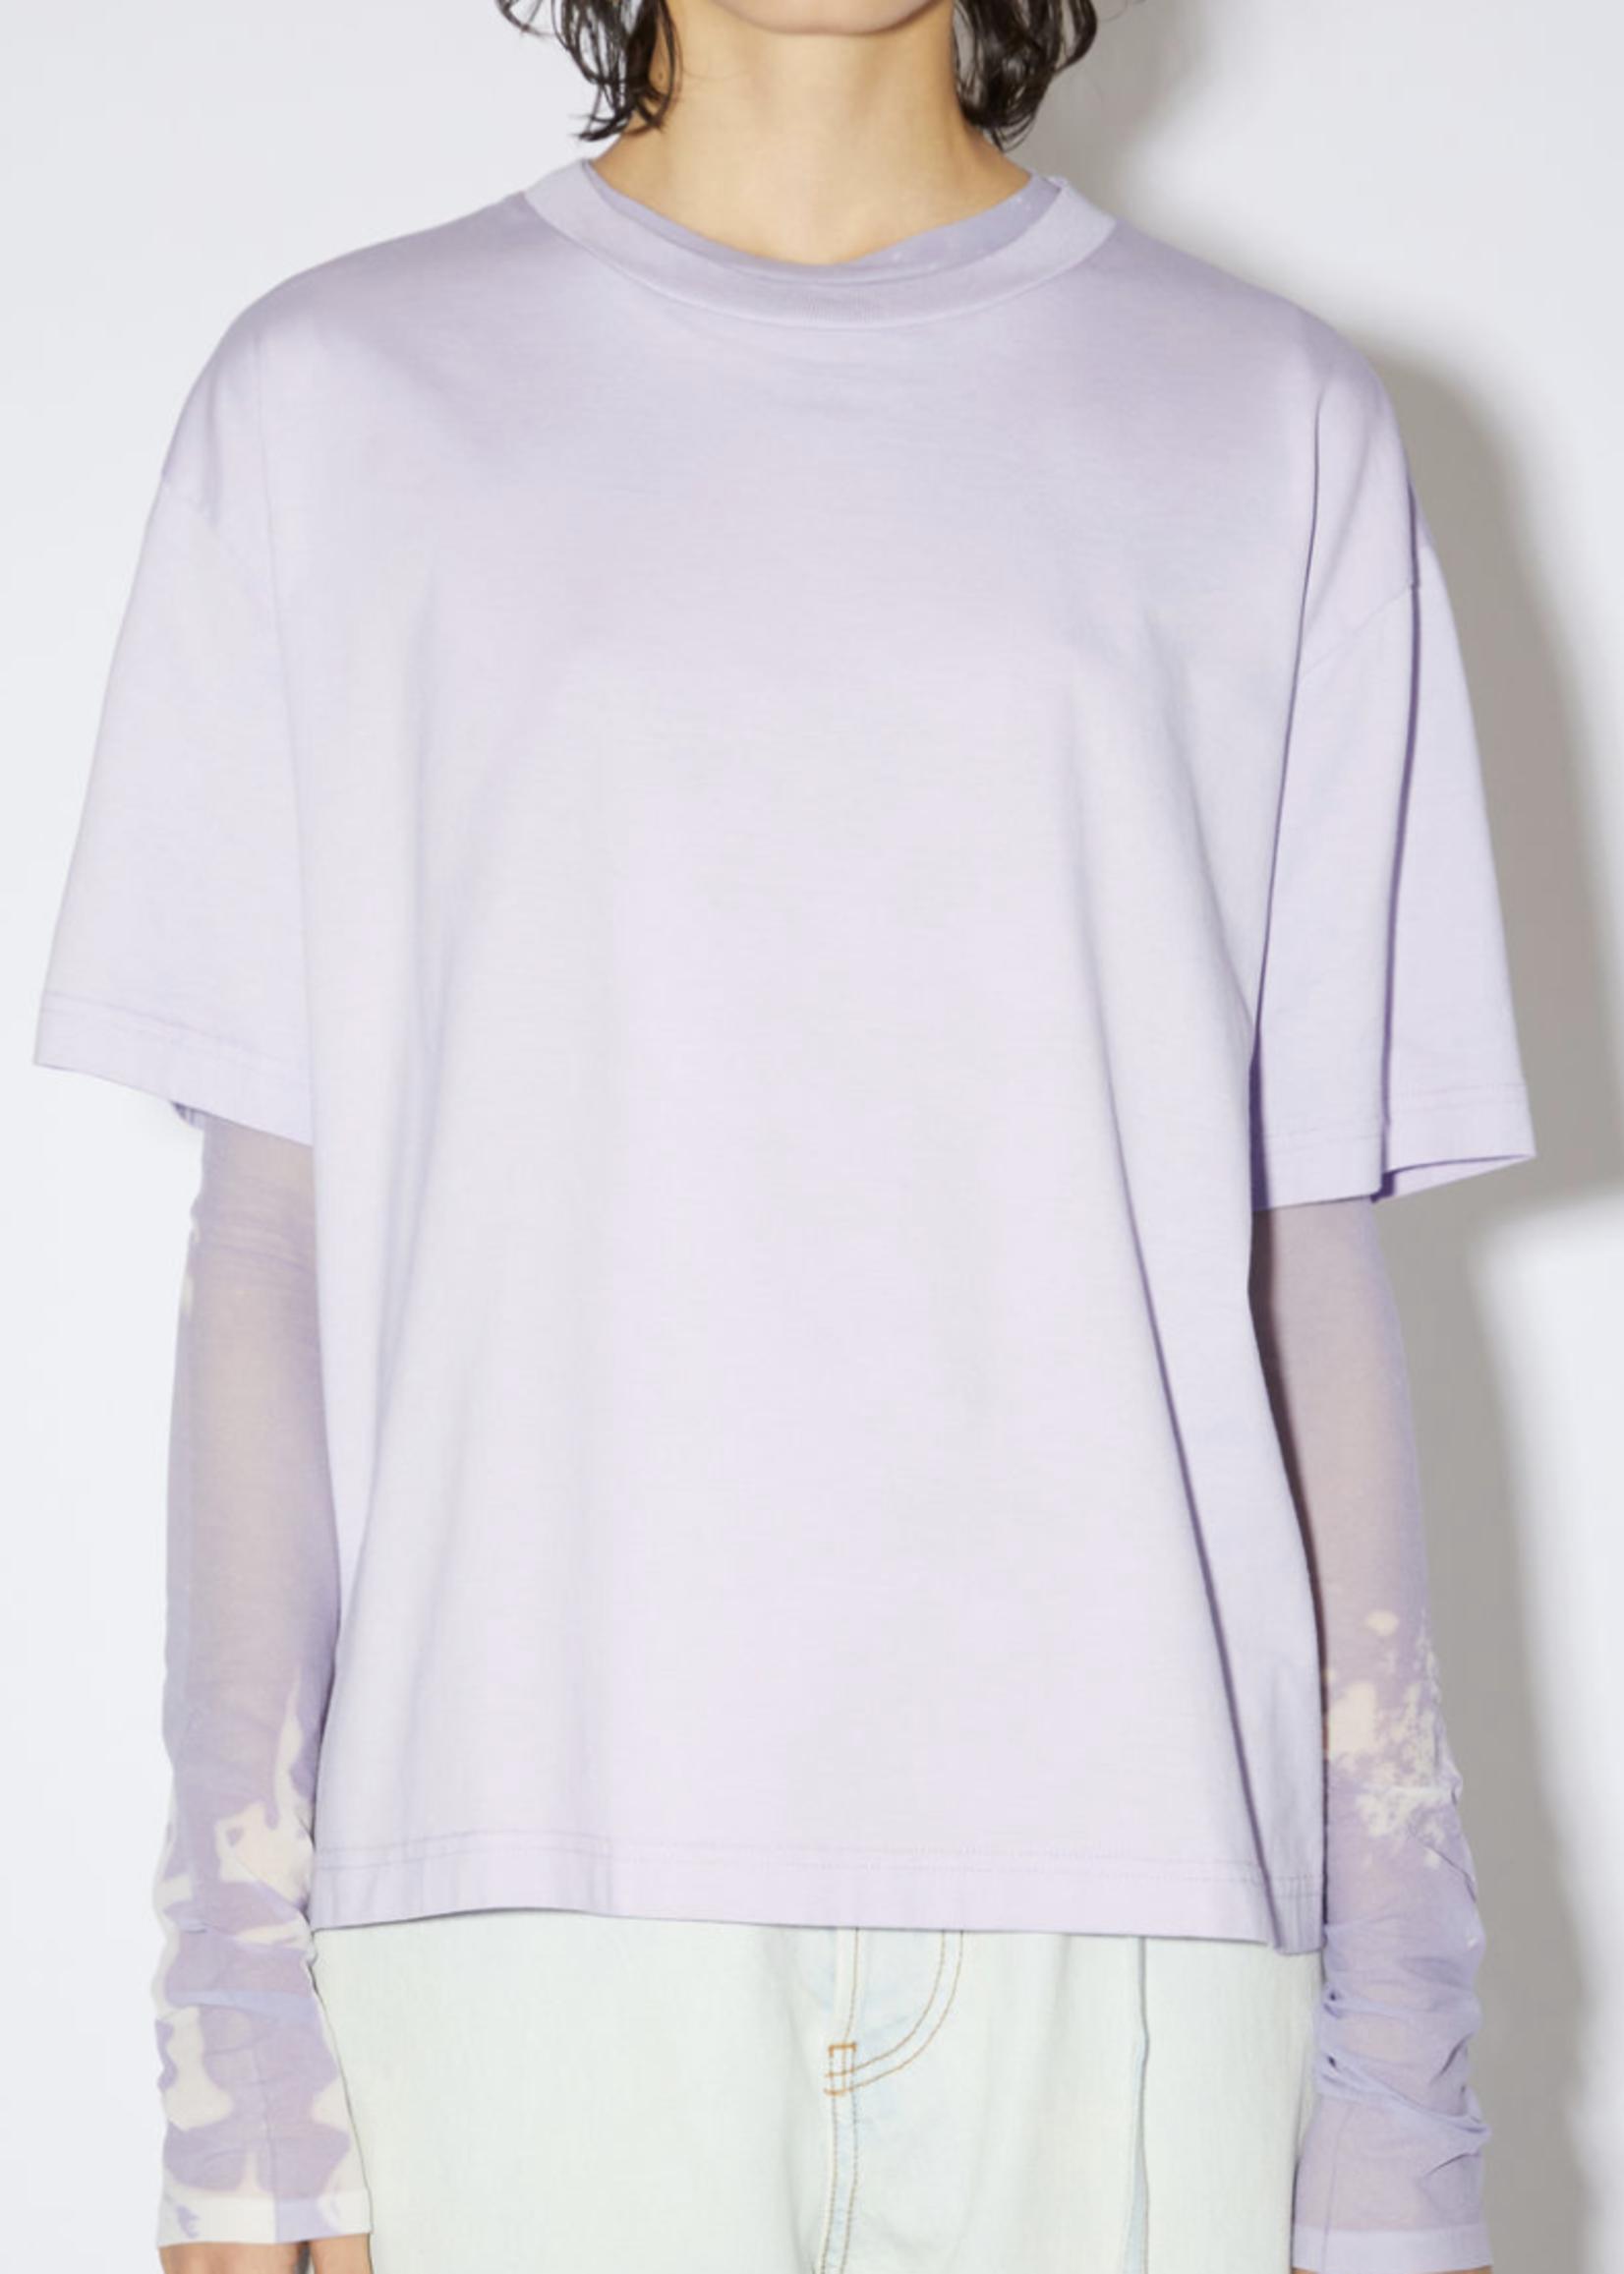 Acne Studios Acnestudios edie pink label shirt short sleede